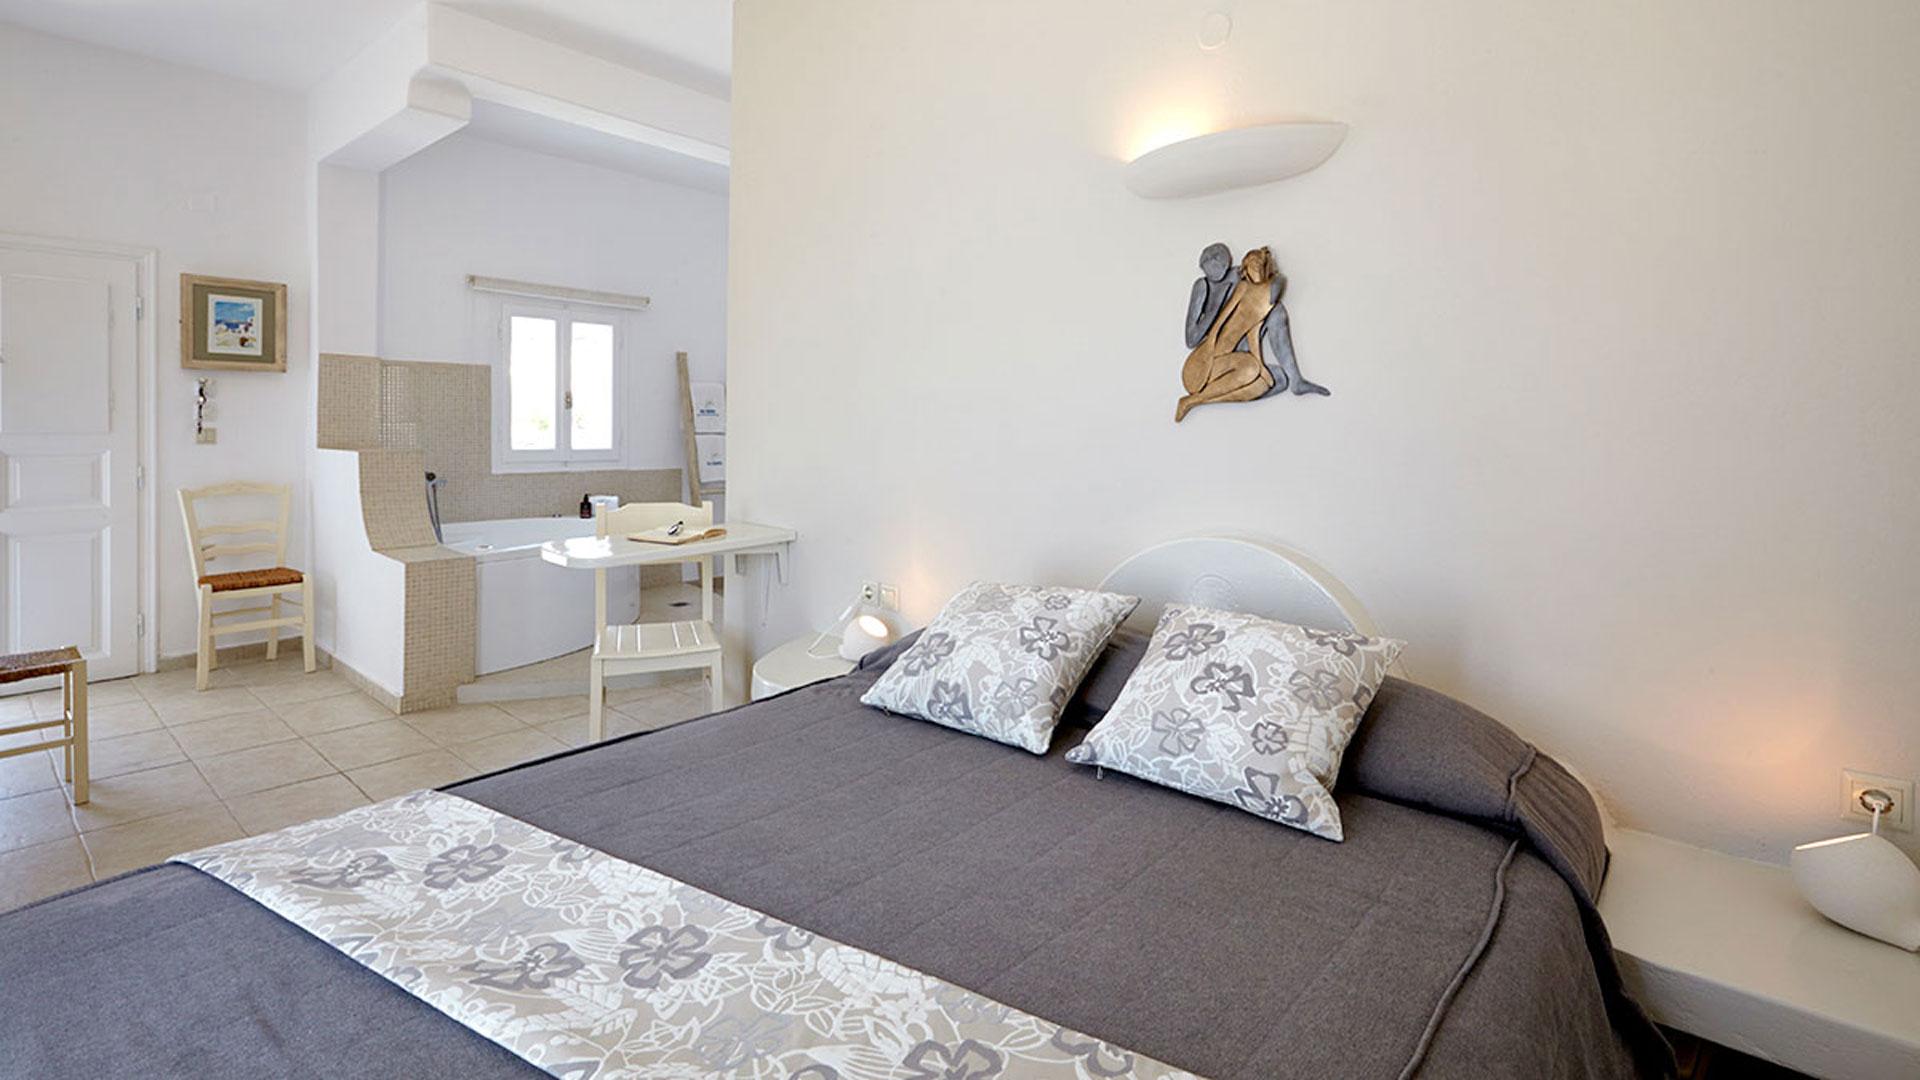 Honeymoon Suite with jacuzzi in Santorini View to firostefani